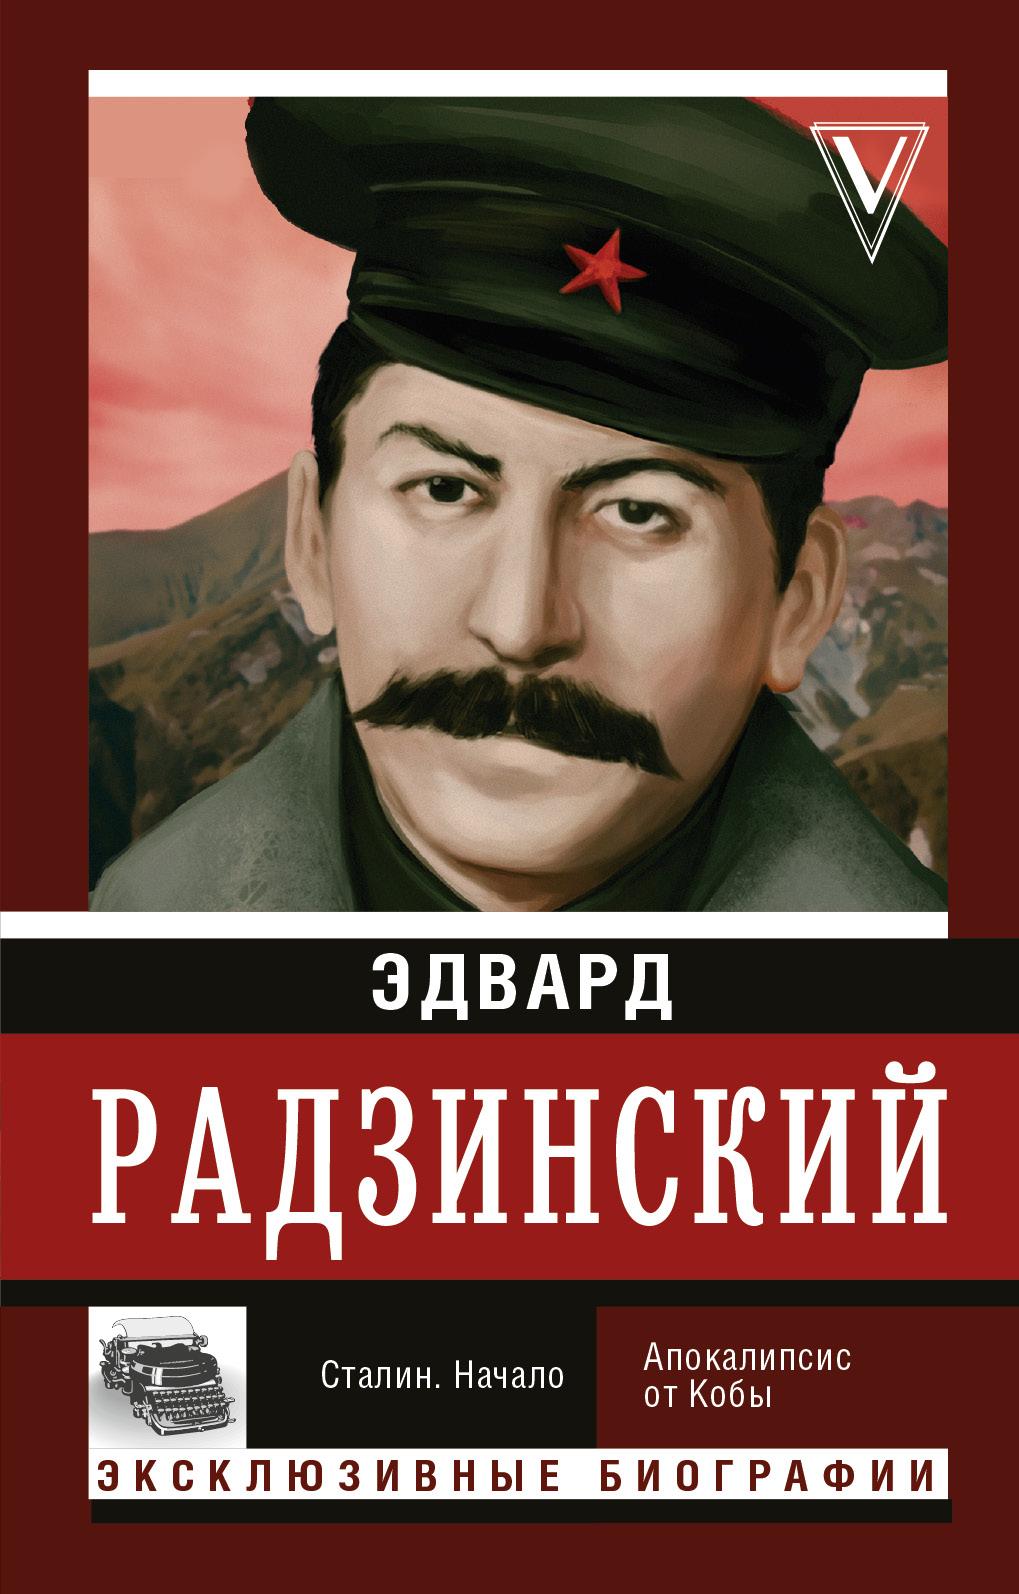 Сталин. Начало